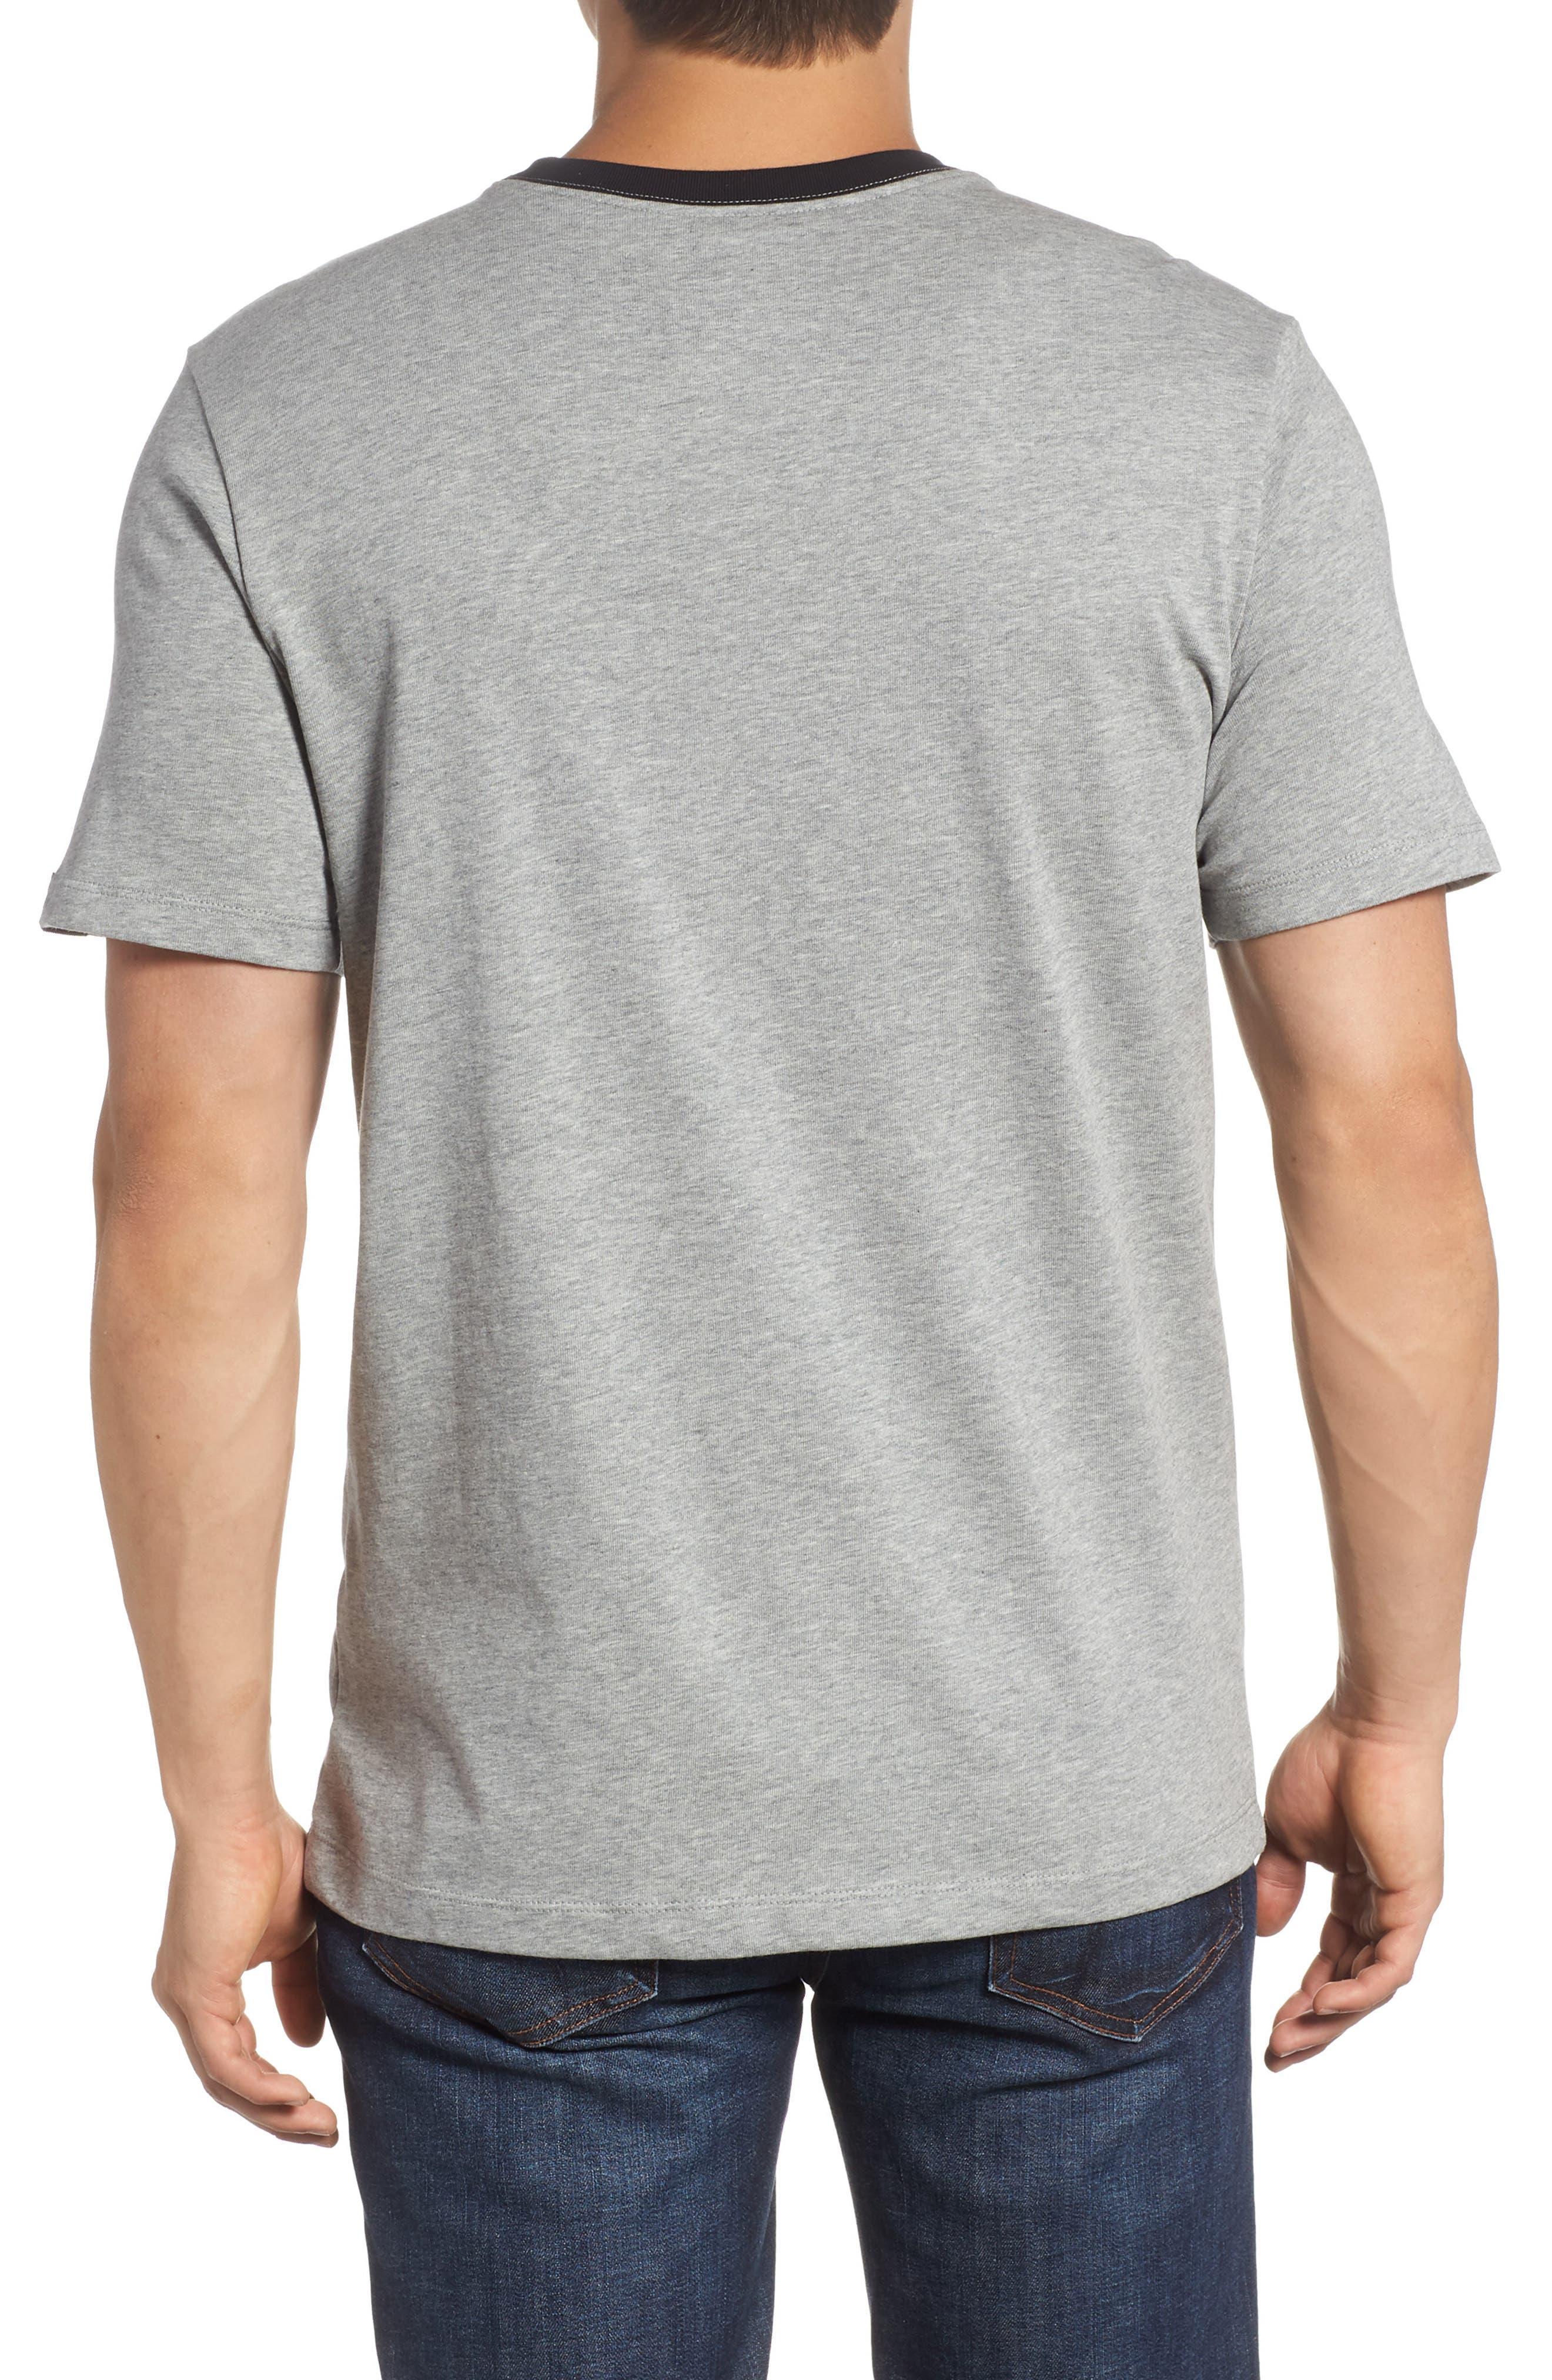 Windrunner Colorblocked T-Shirt,                             Alternate thumbnail 2, color,                             BLACK/ DK GREY HEATHER/ WHITE